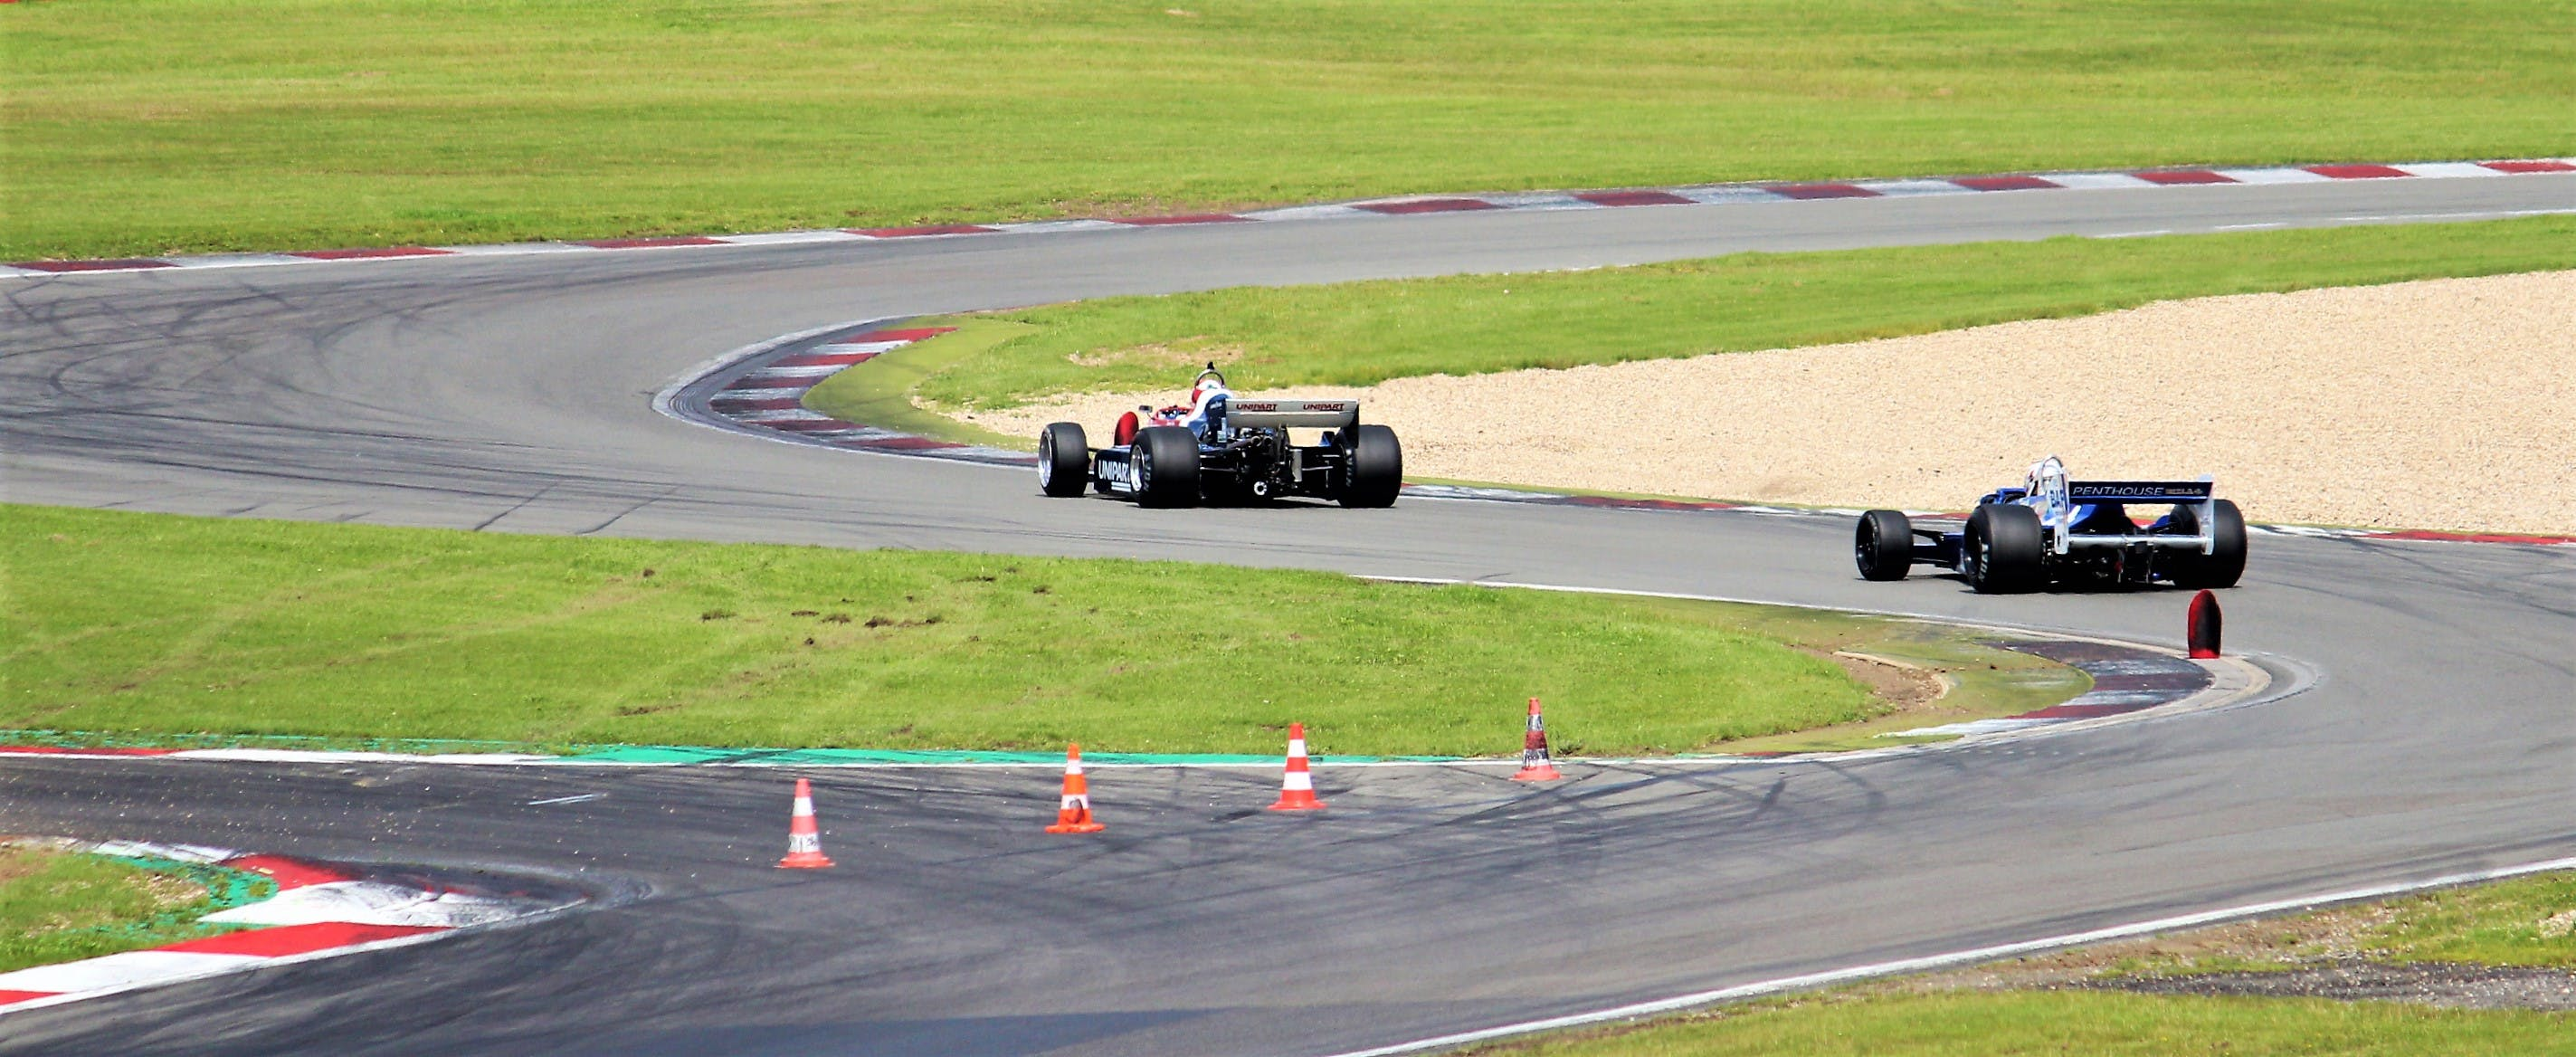 Free stock photo of car, f1, auto racing